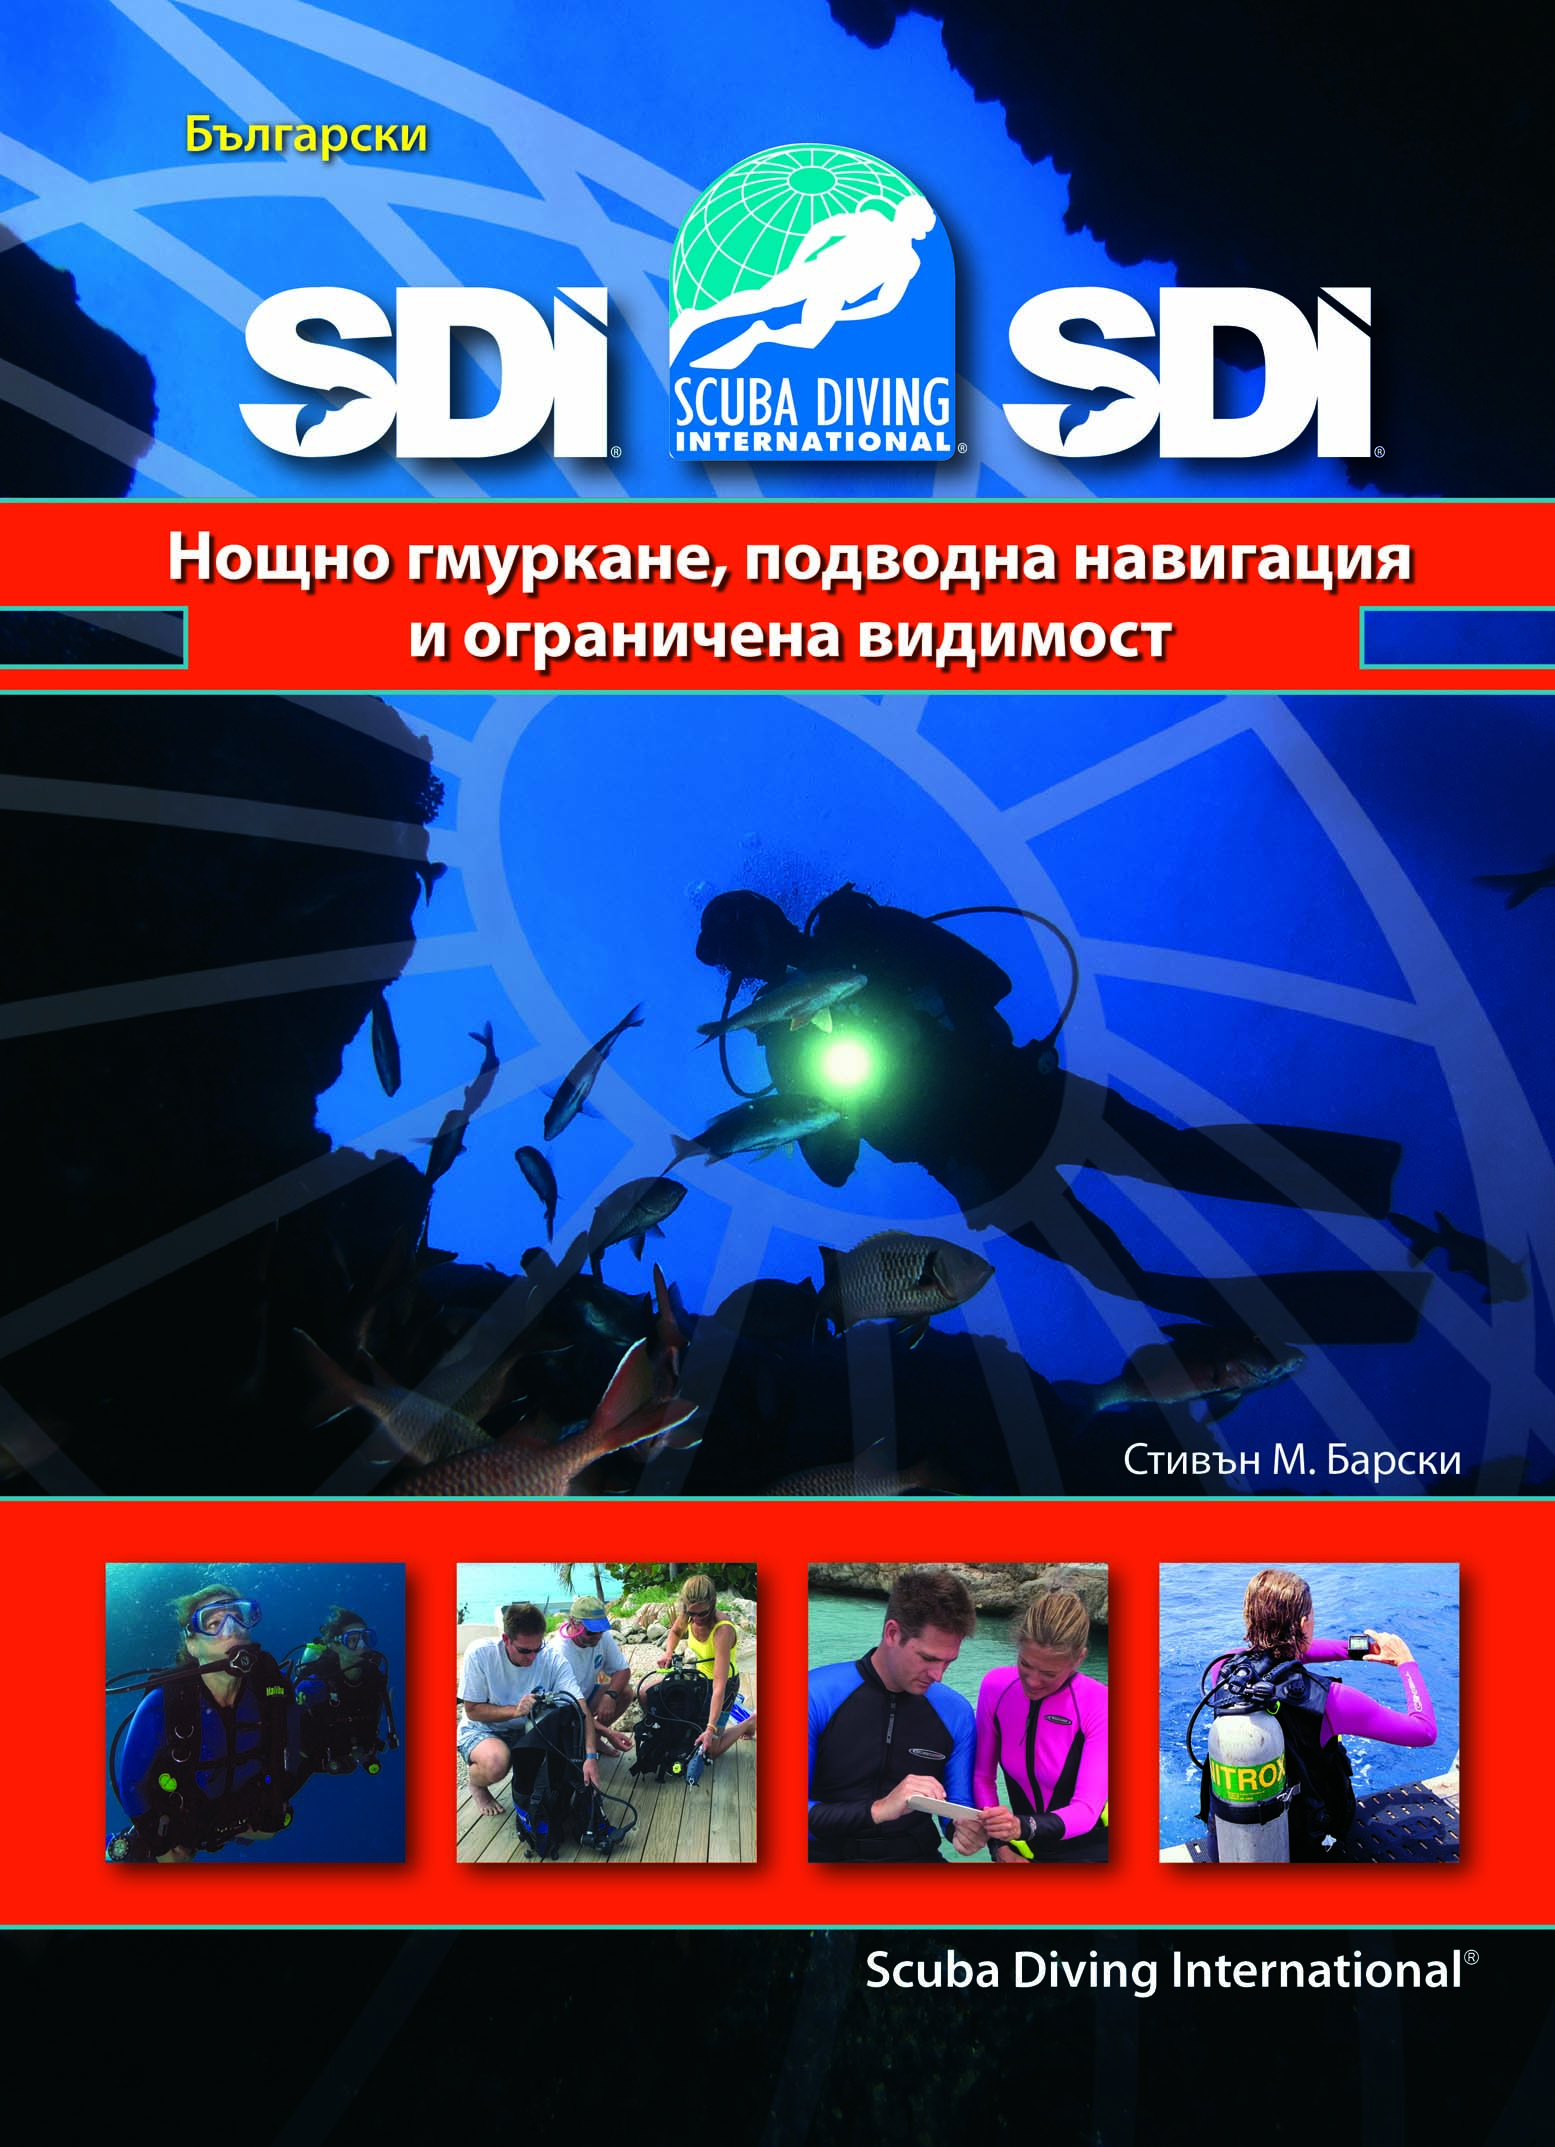 SDI Нощно гмуркане, подводна навигация и ограничена видимост ( SDI Nigh, Low Visibility and Underwater Navigation ) - учебник на български език